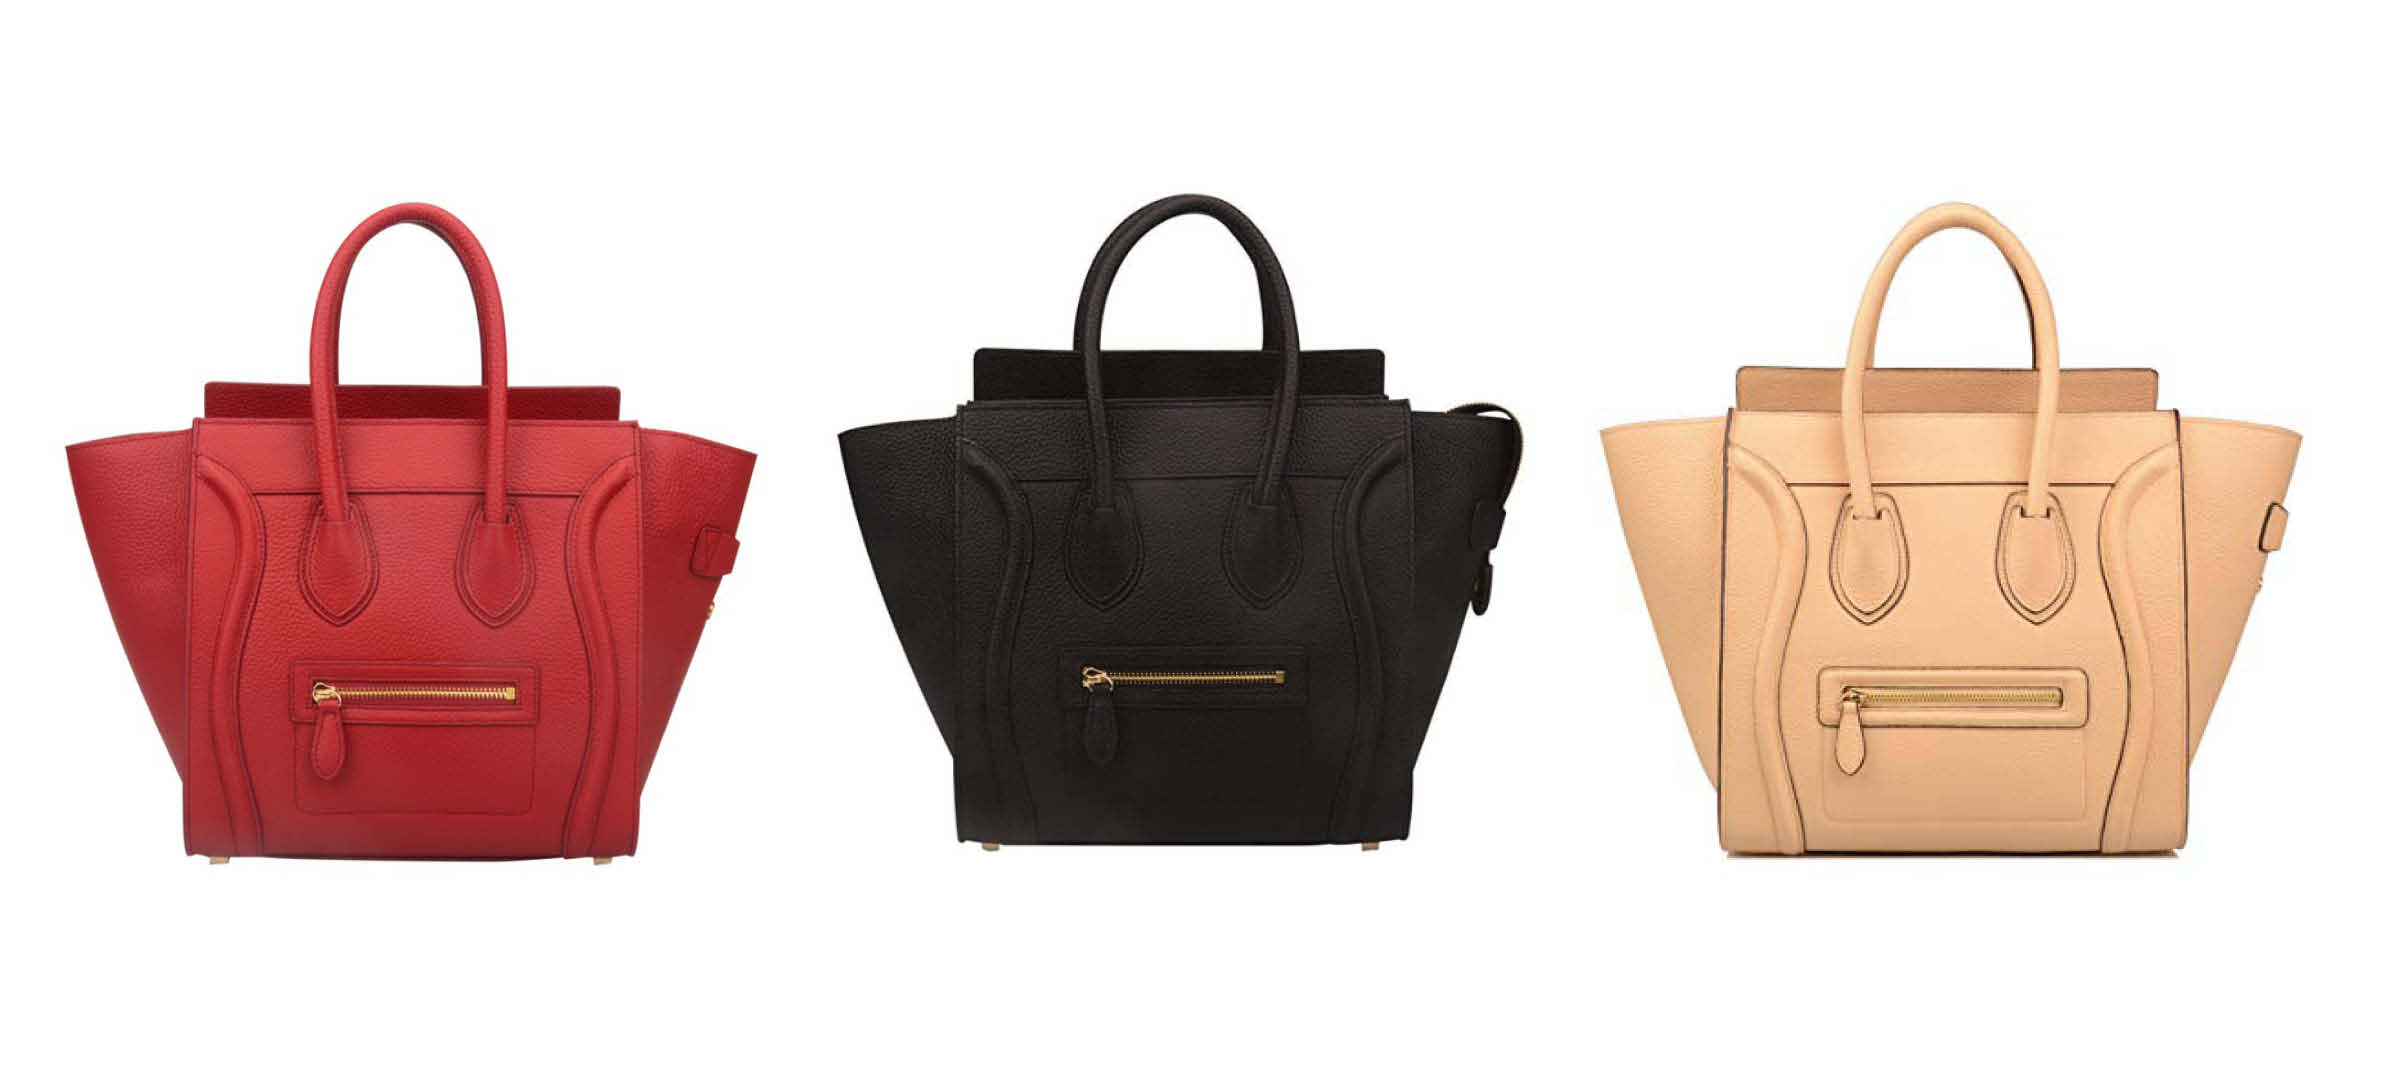 Céline And Micro Dupes Mini Amazon Tote Dupe Luggage On Nano qw4B1qra